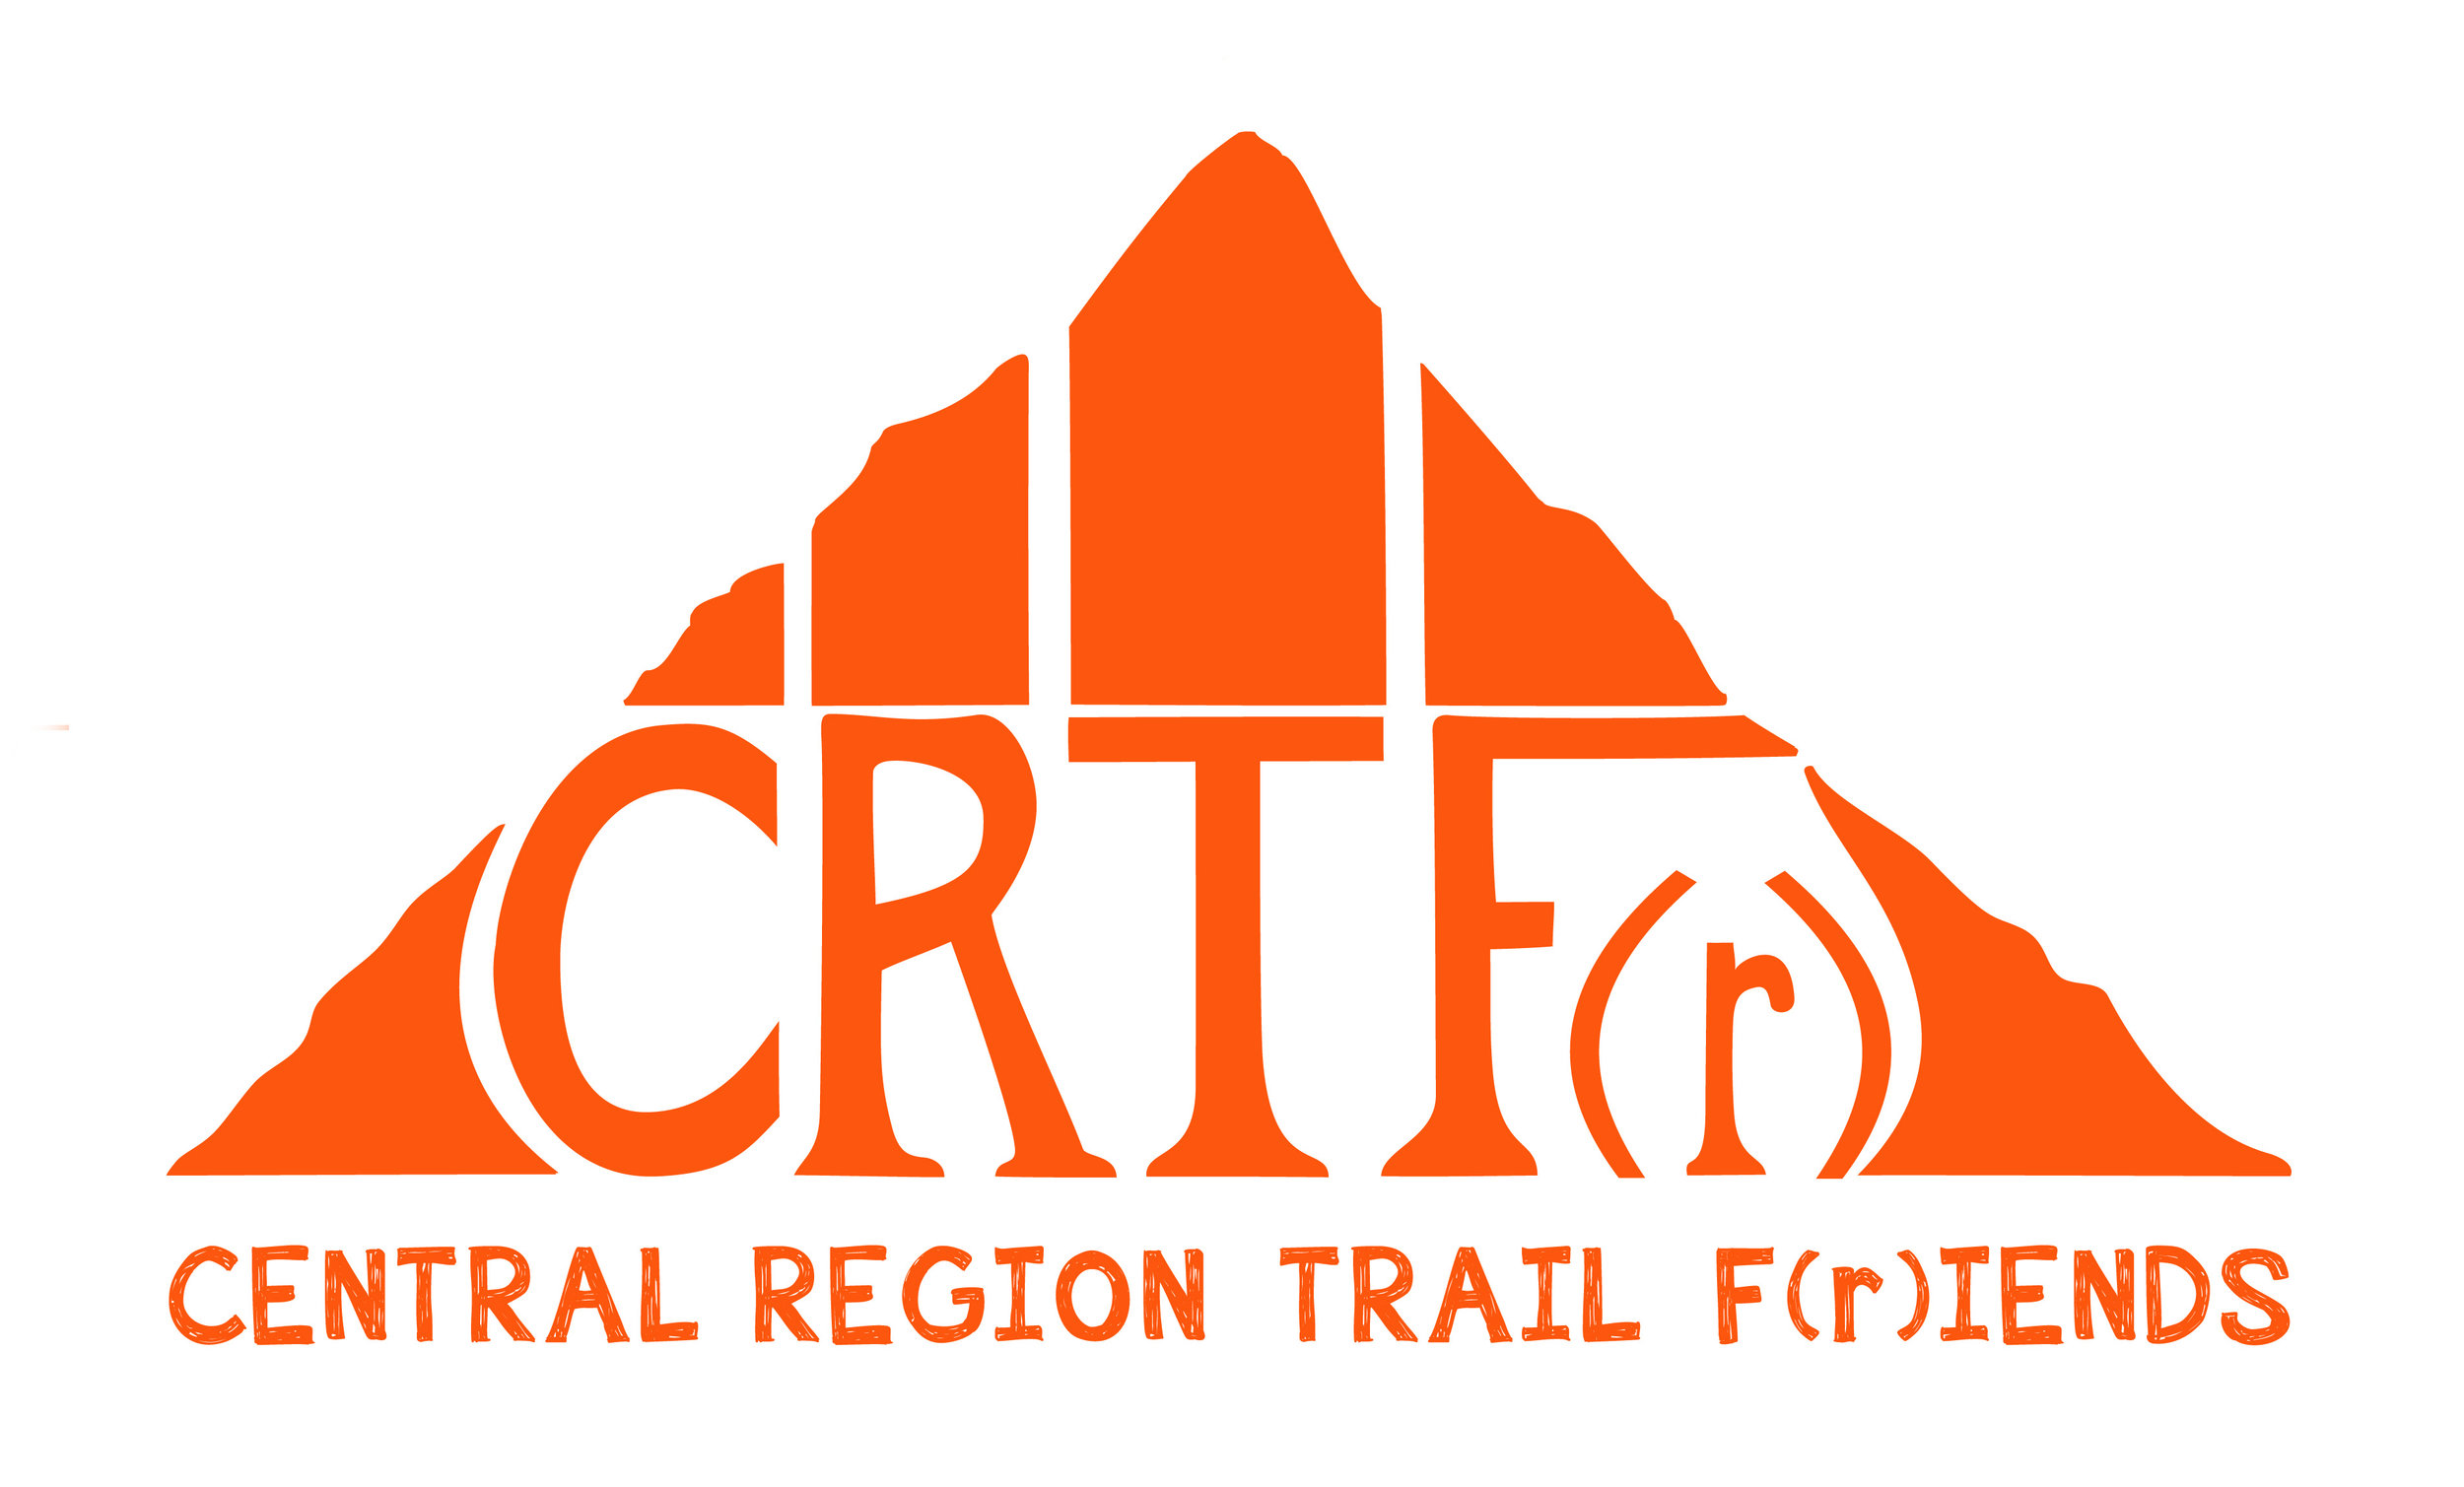 69800 Central Region Trail Friends-1.jpg